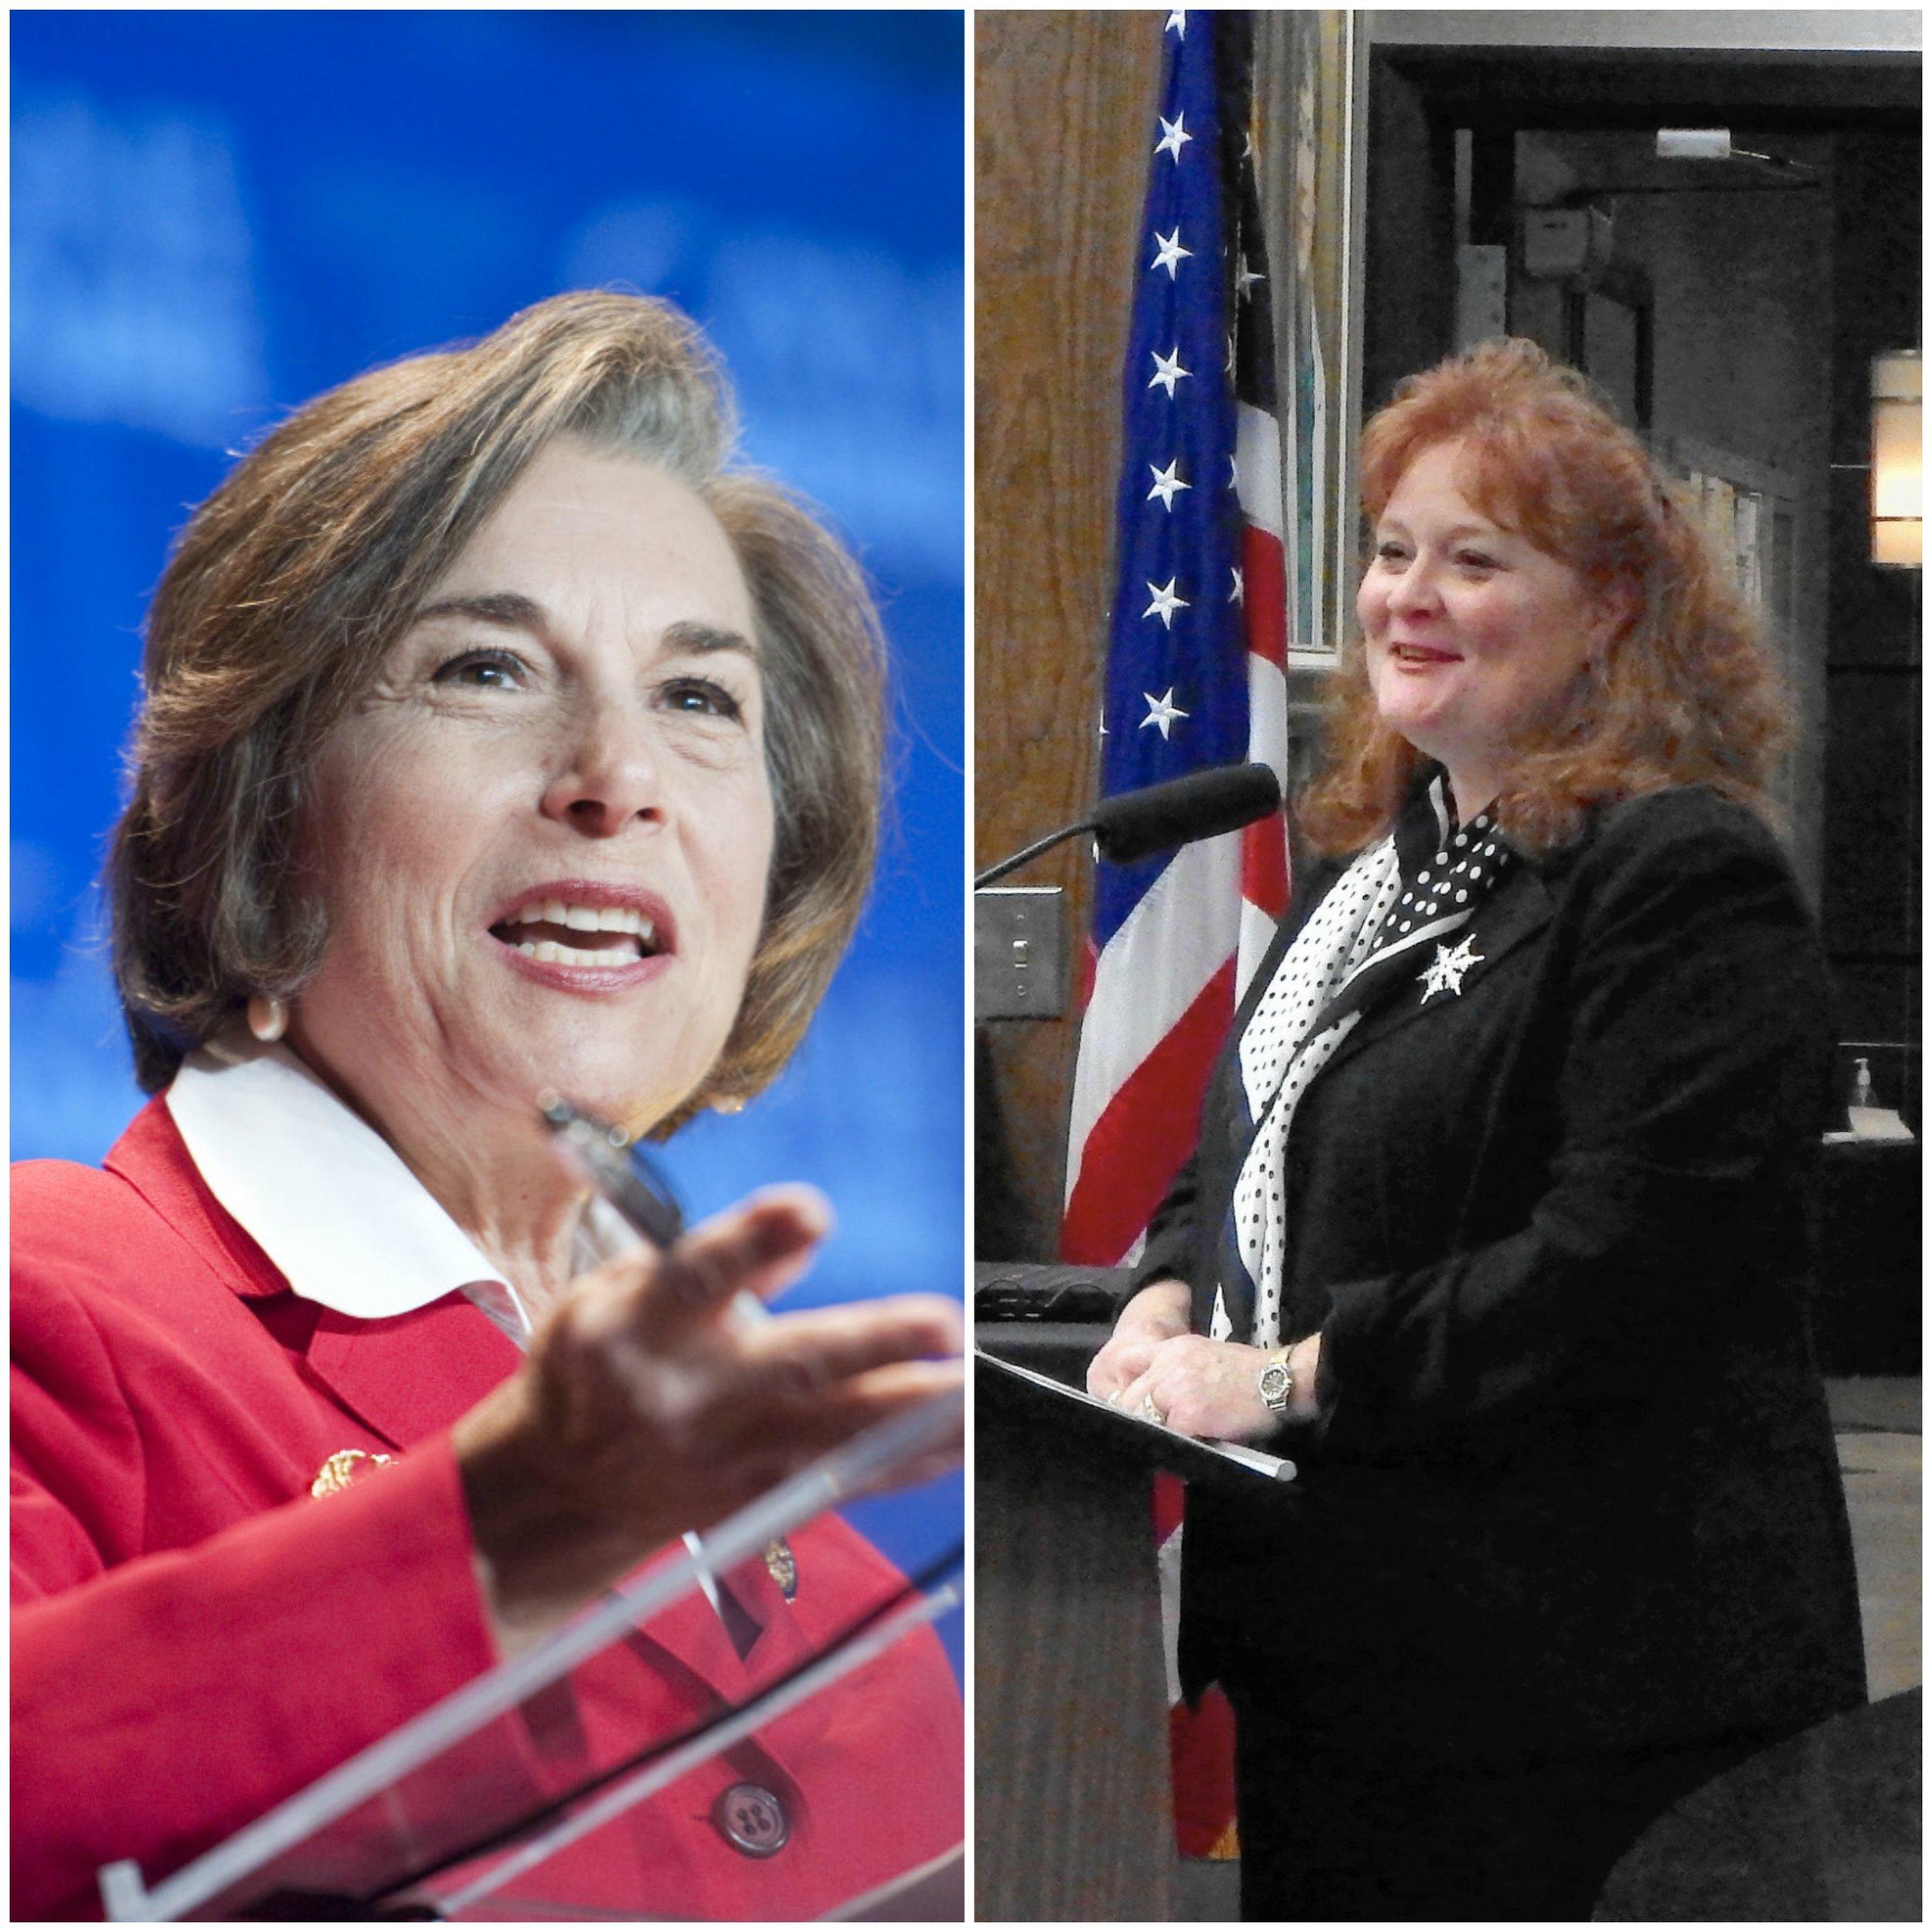 United States Congresswoman Jan Schakowsky (left) and Illinois State Senator Laura Murphy (right).